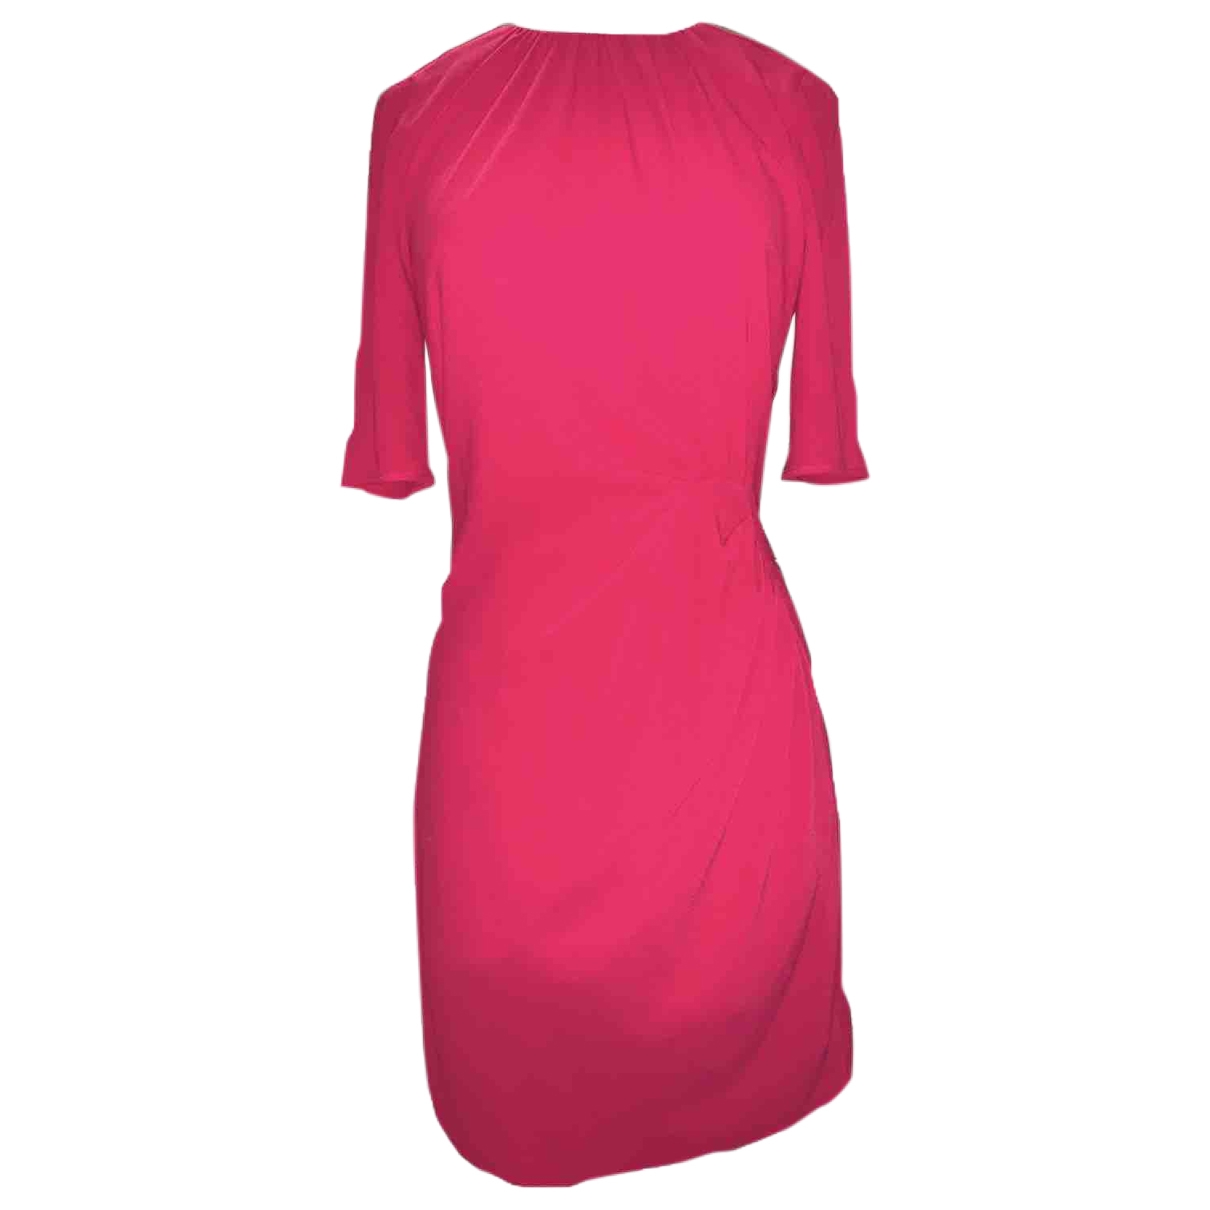 Whistles \N Pink dress for Women 8 UK